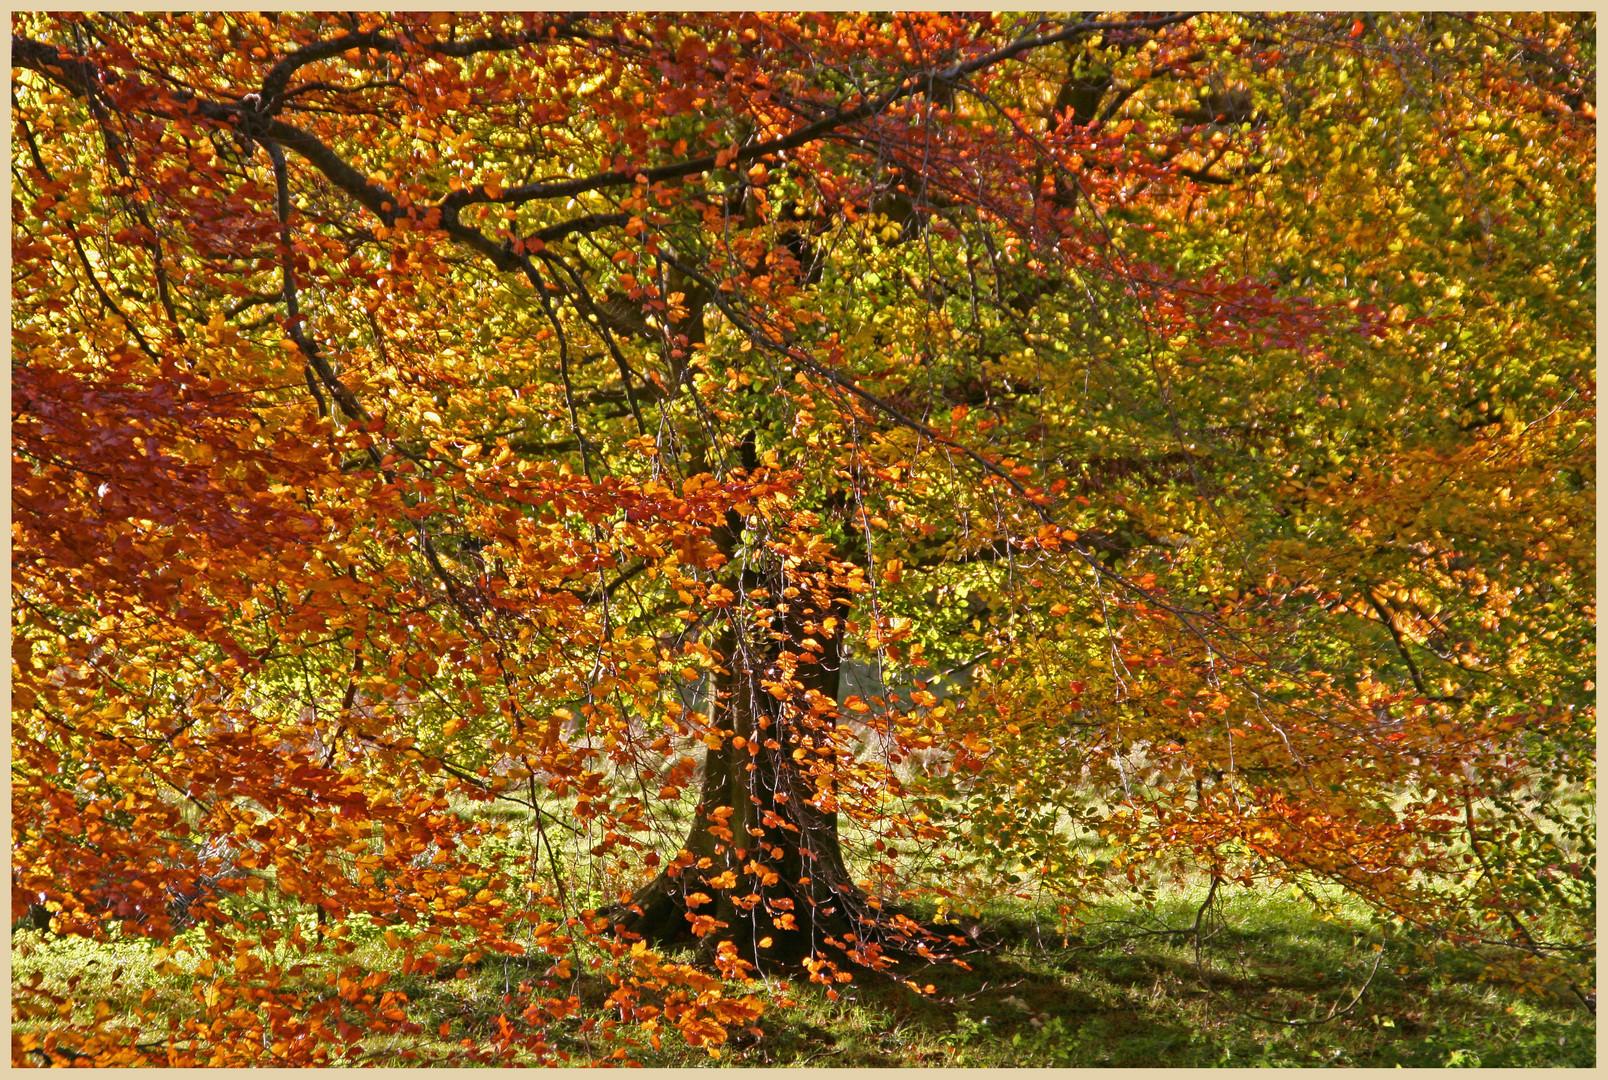 Beech trees at thropton